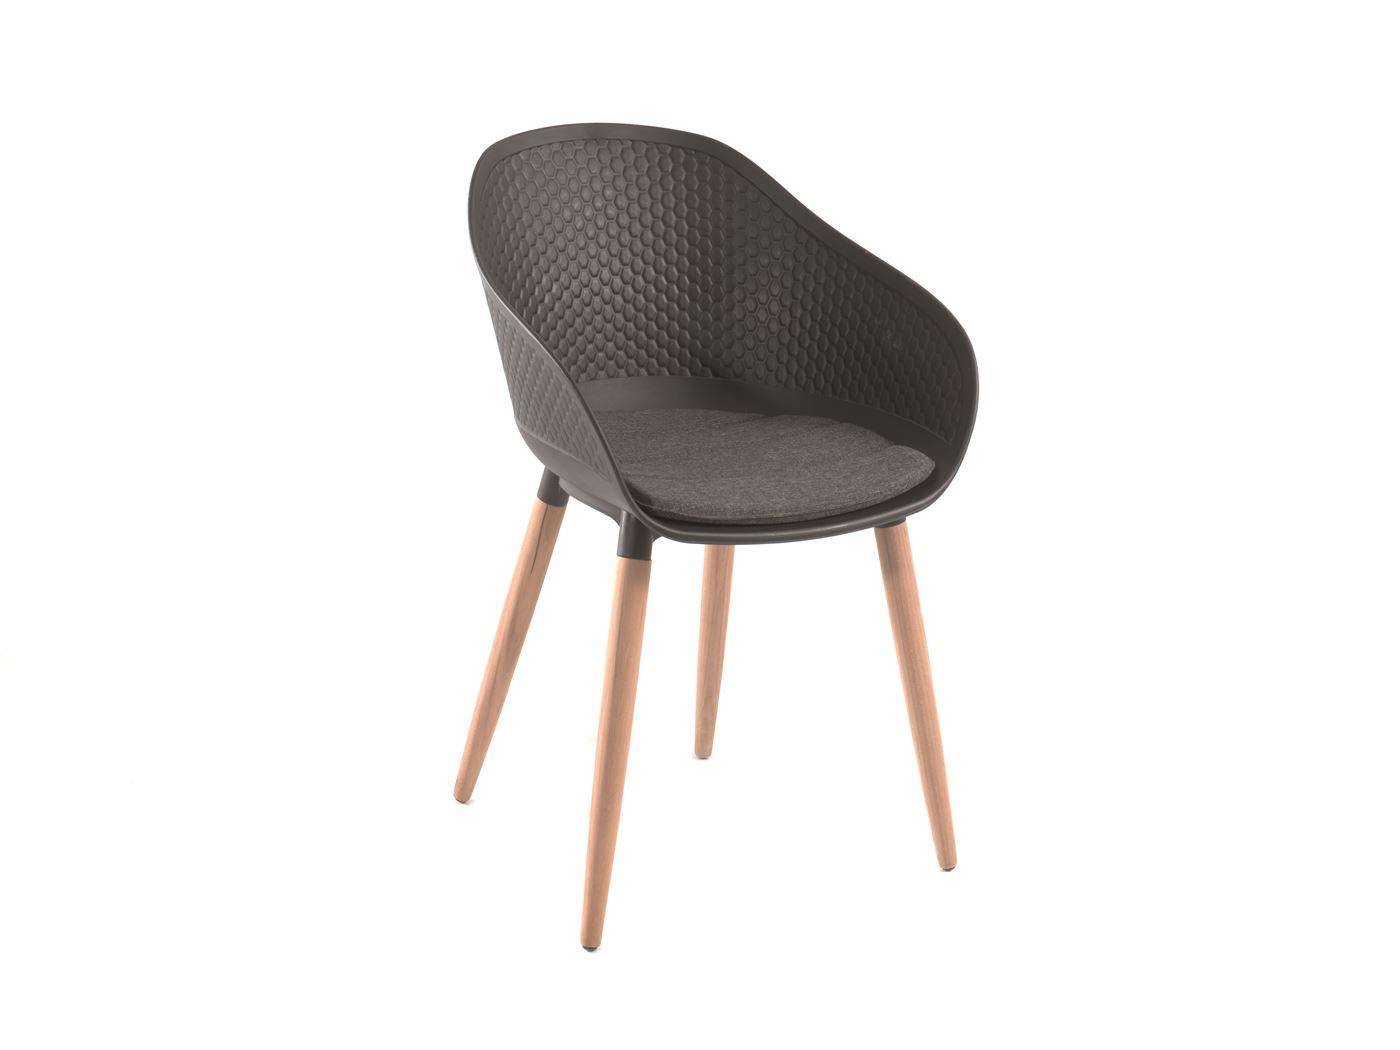 gescova kopenhagen design chair synthetic black+ teak legs